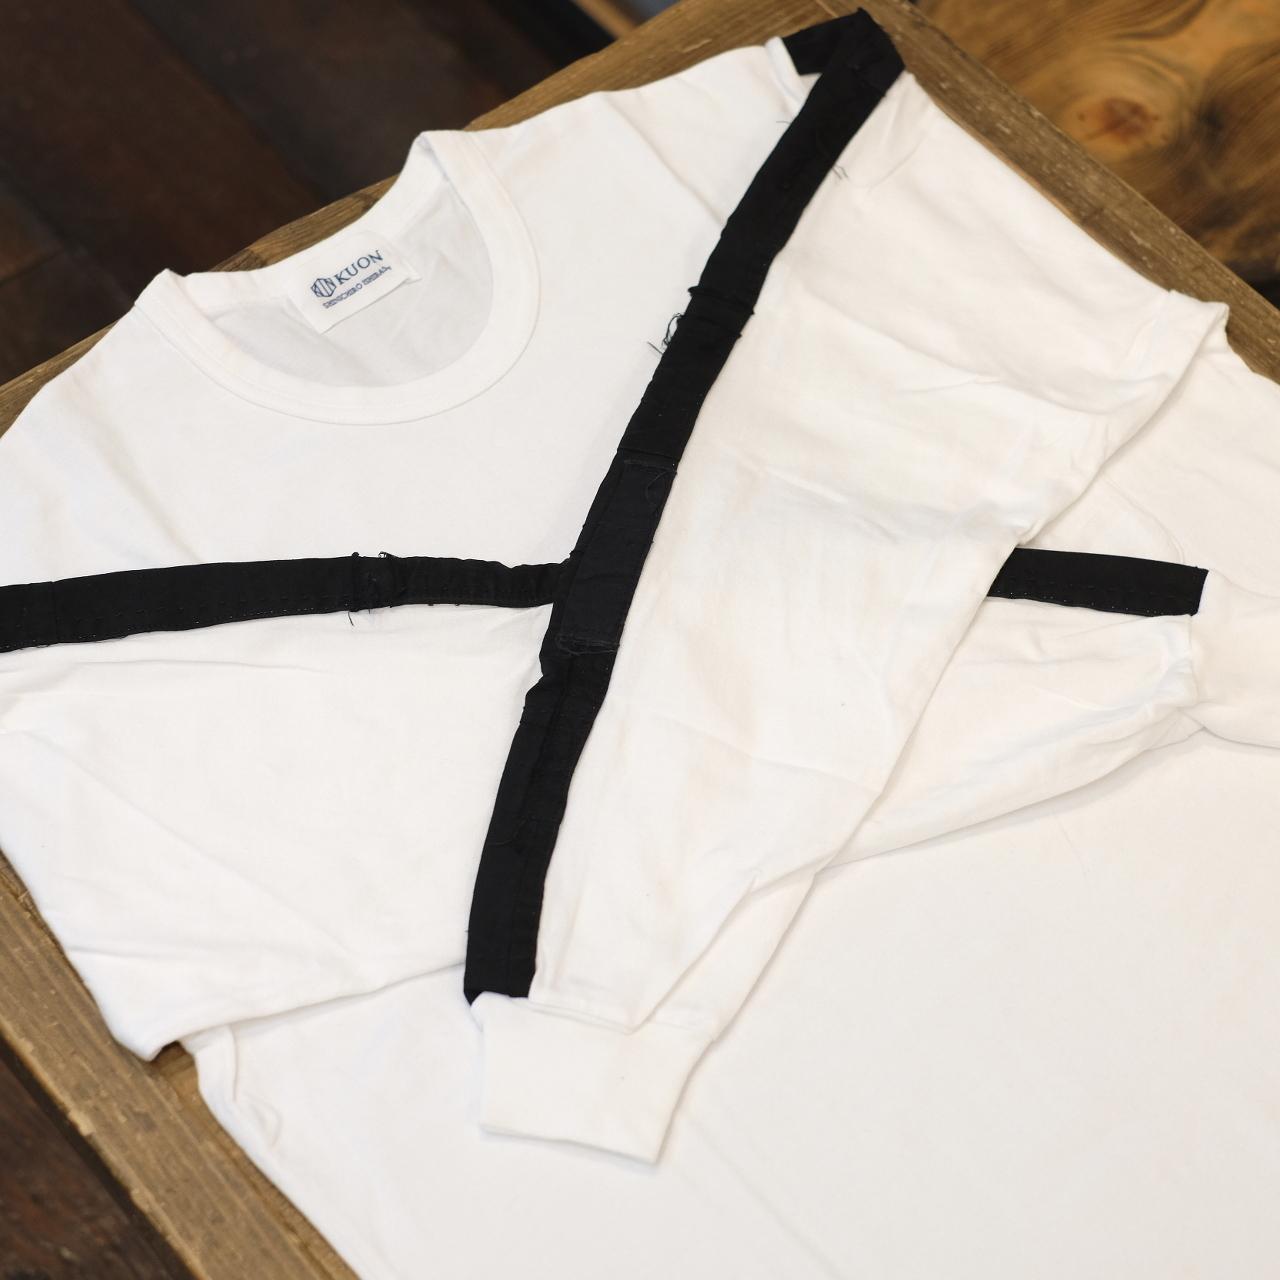 KUON(クオン) アップサイクル トリミングロングTシャツ ホワイト×ブラック